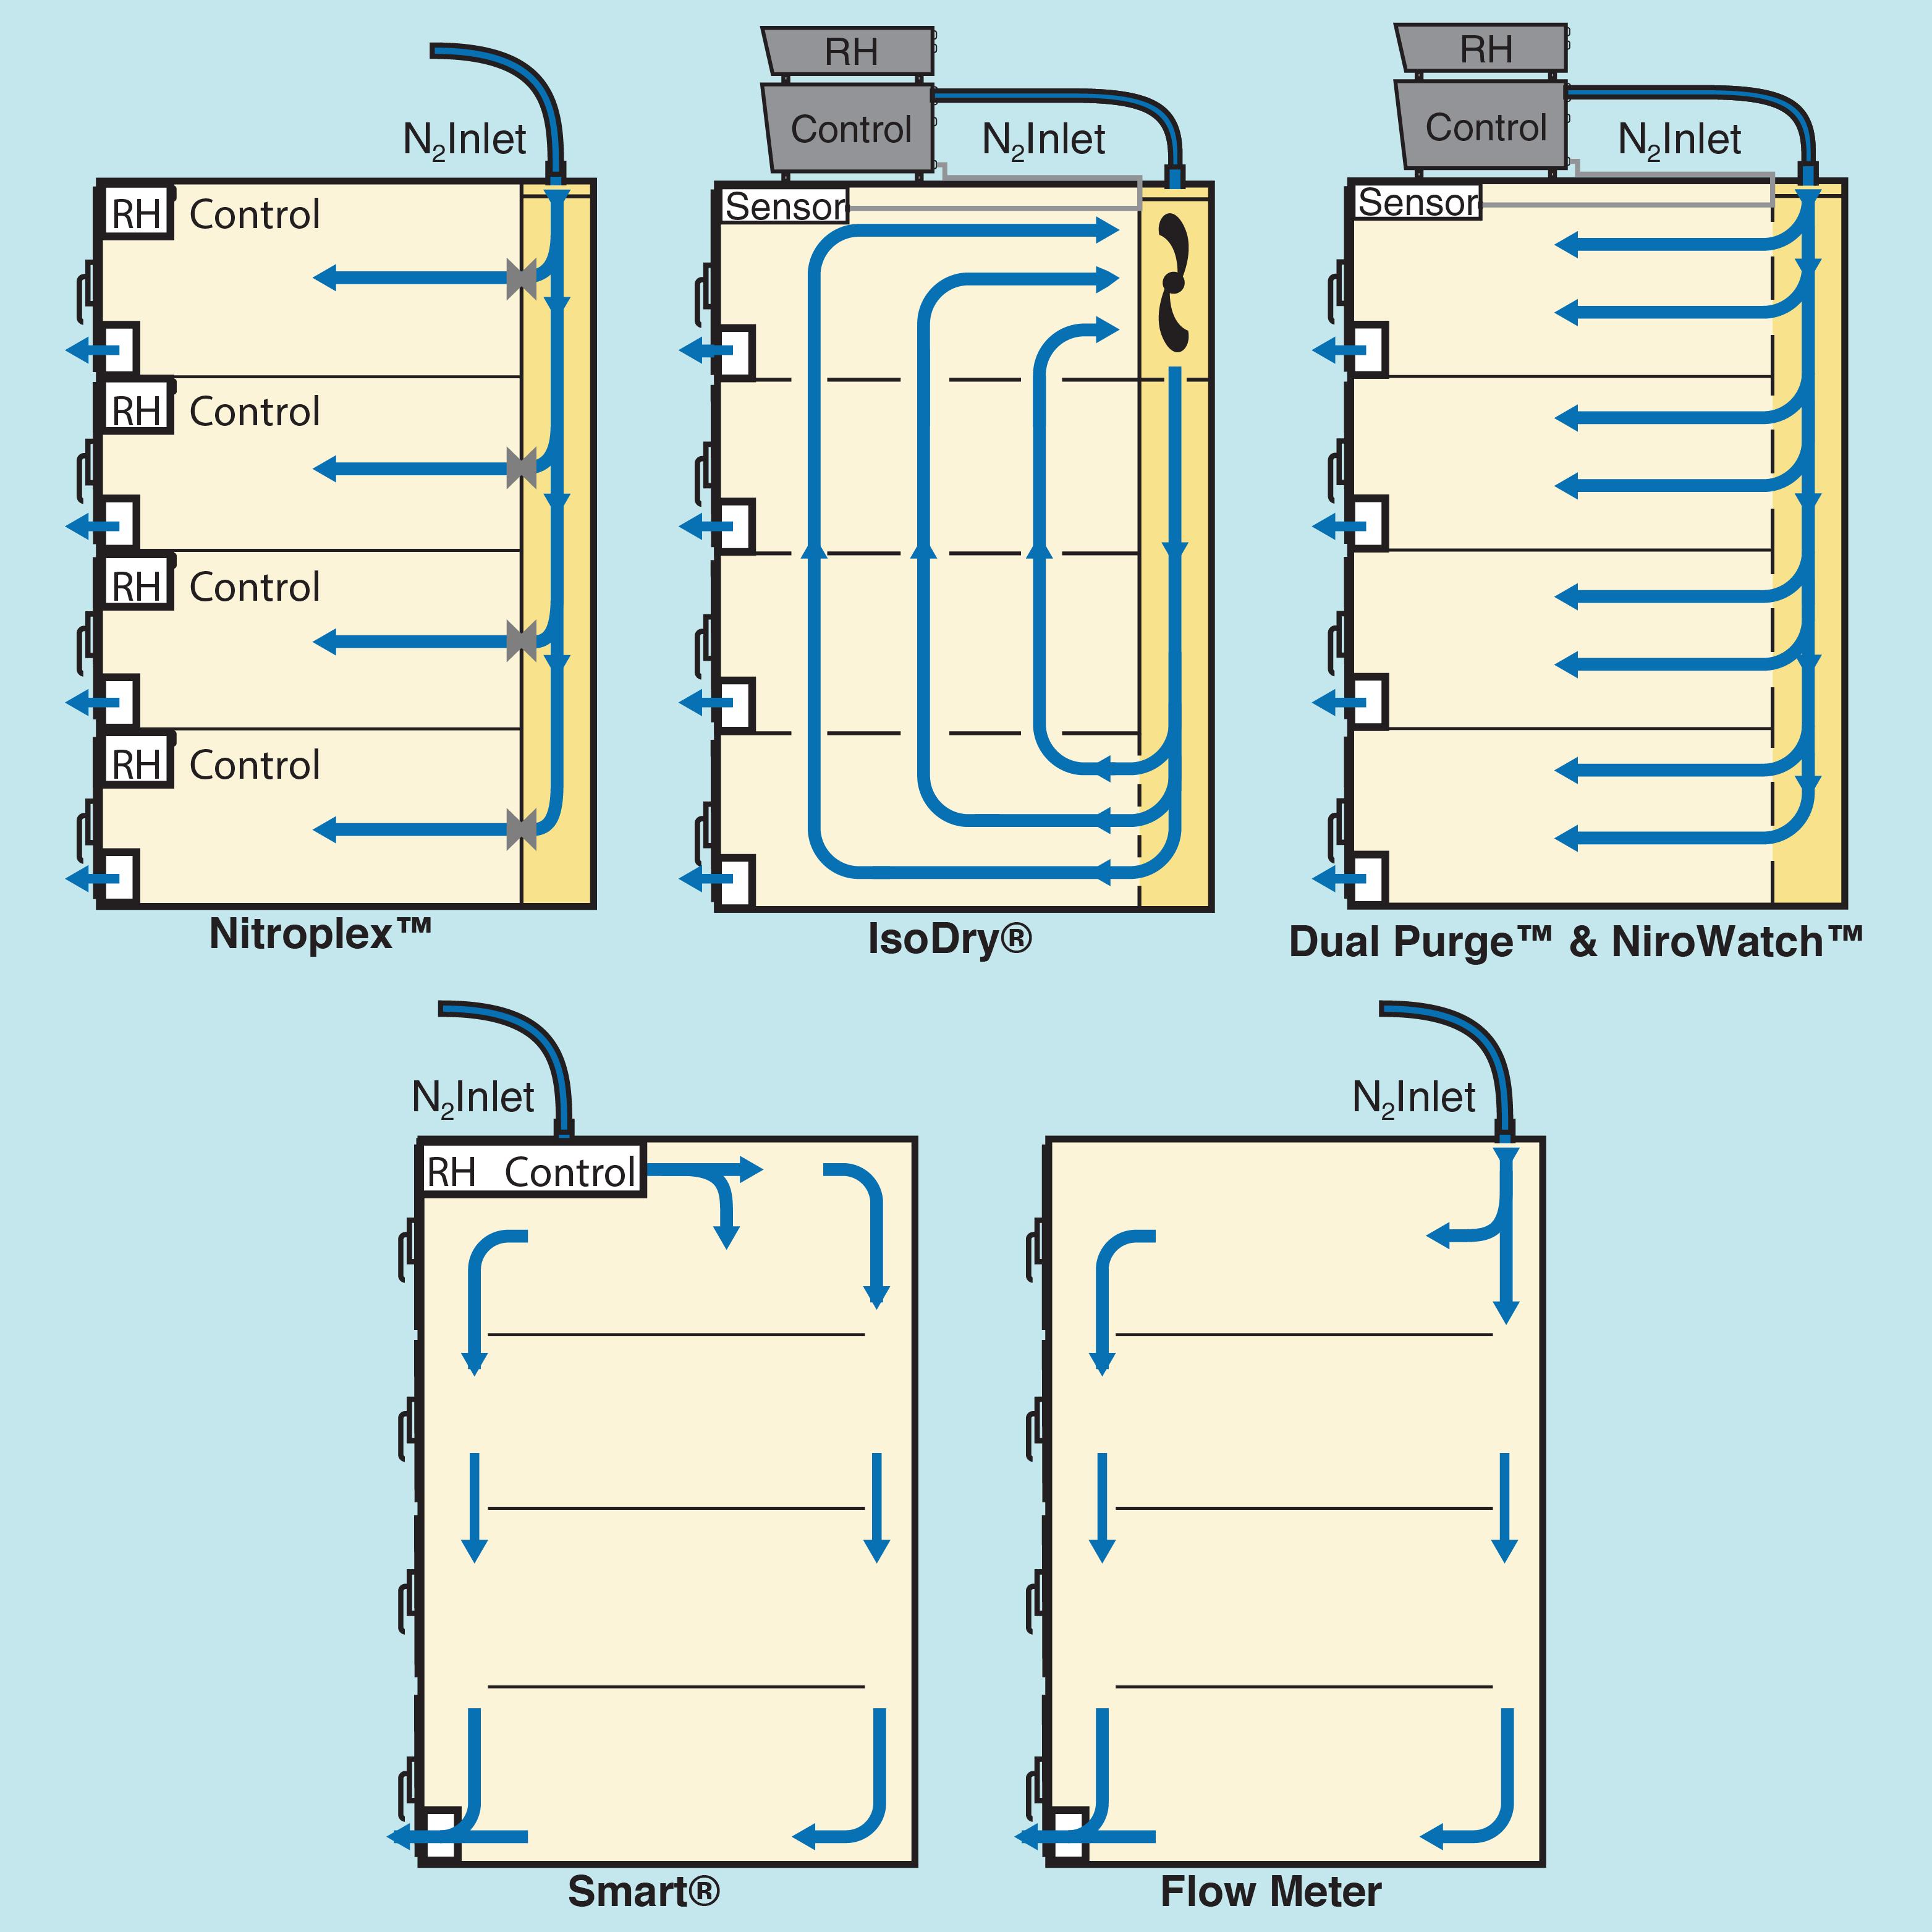 Desiccator airflow diagrams